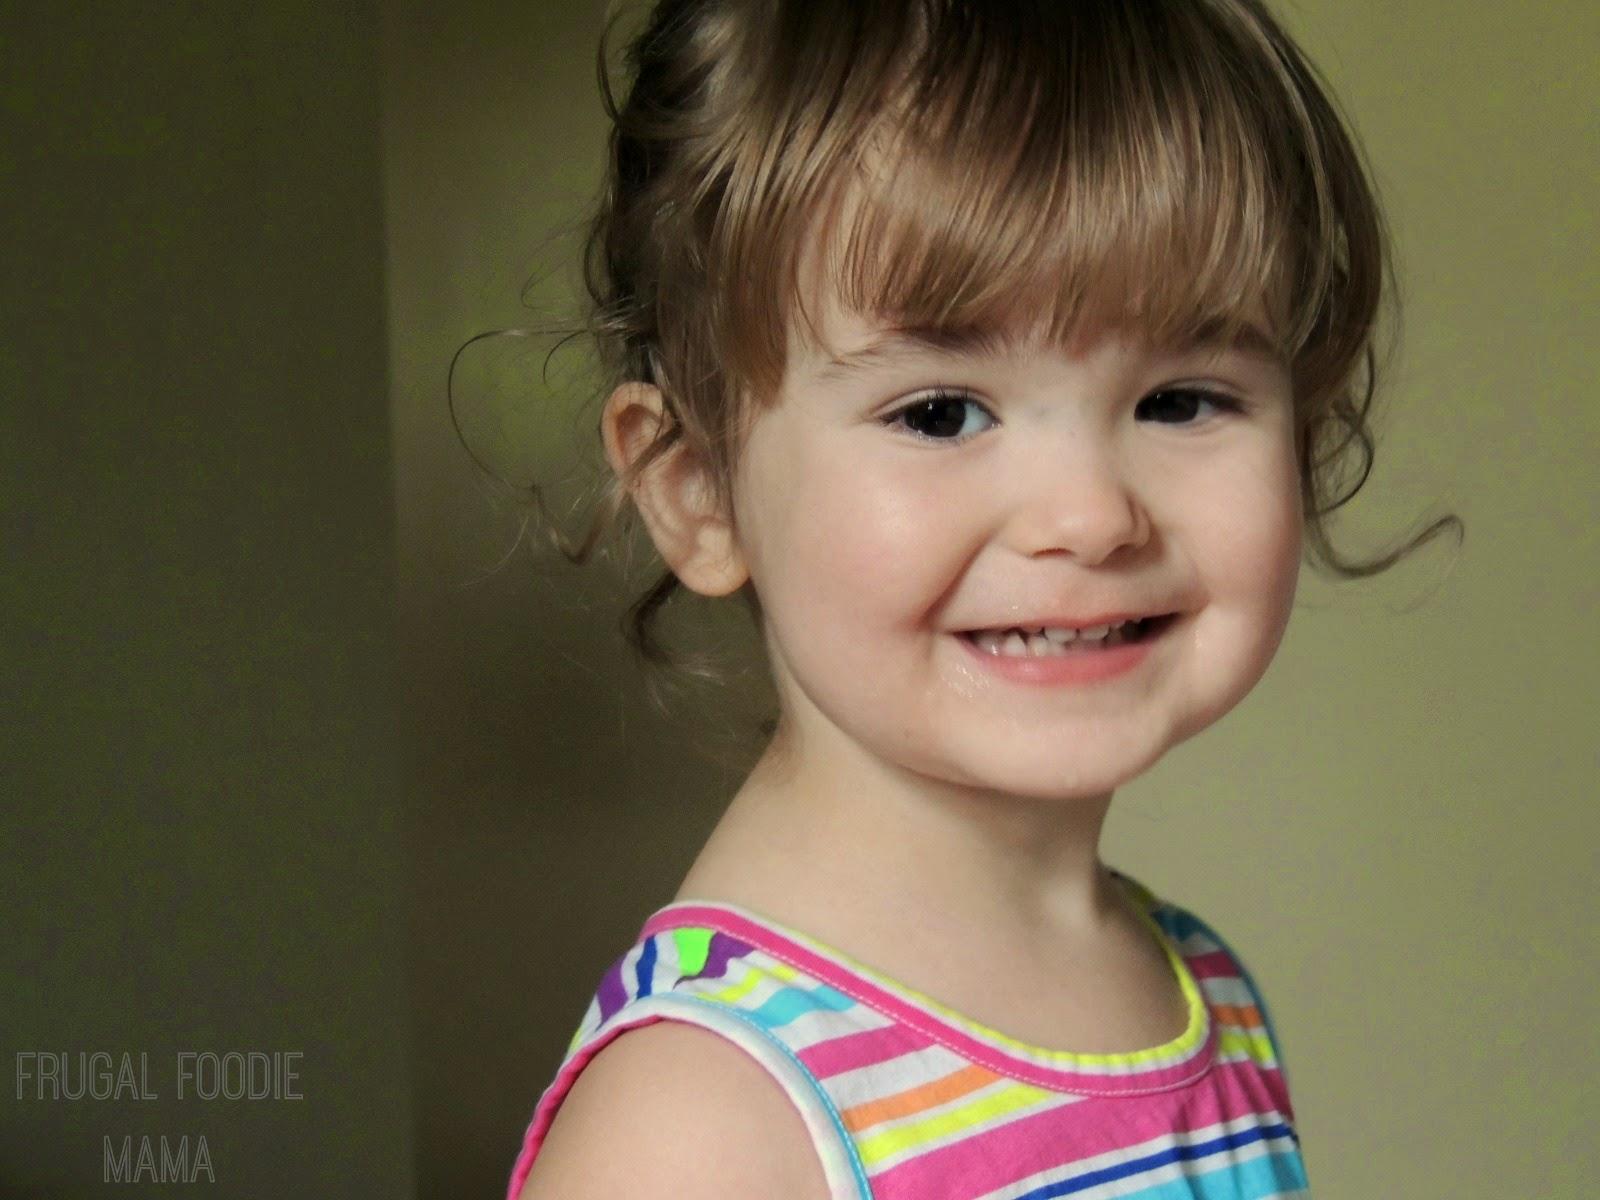 Start baby on a lifetime of healthy teeth with Aquafresh Training toothpaste via thefrugalfoodiemama.com